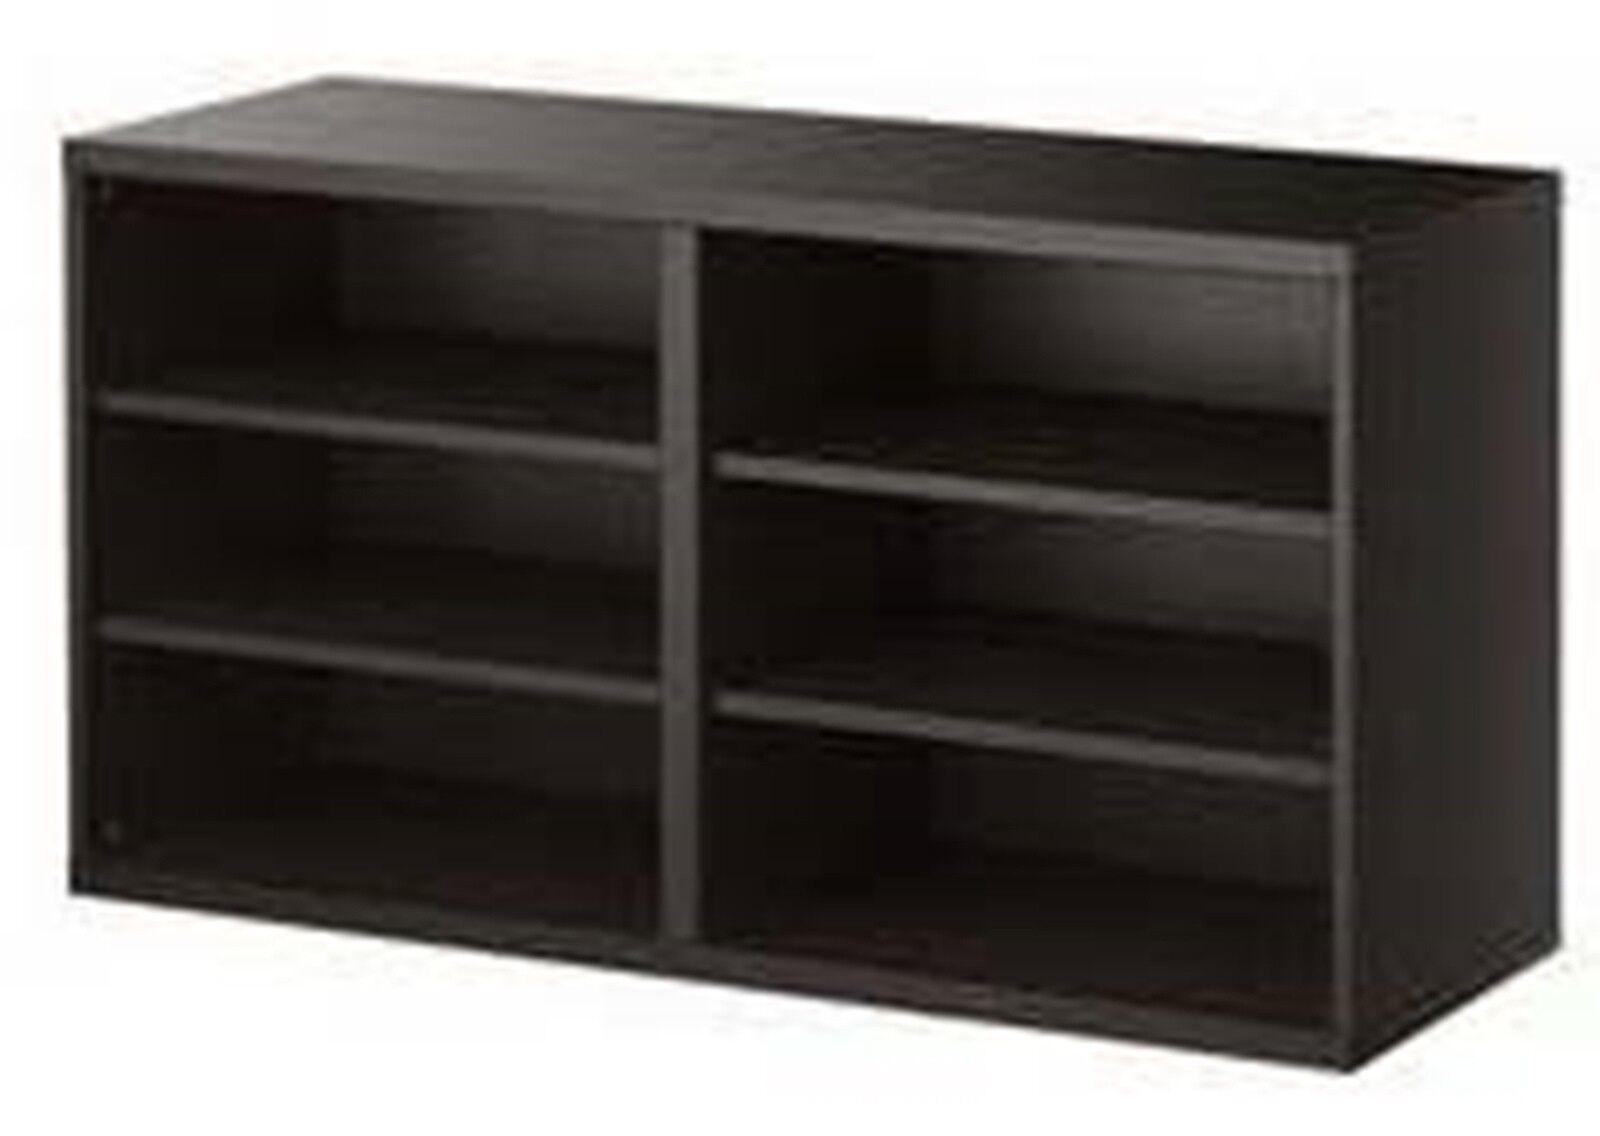 Ikea Besta Shelf Unit Media Storage Black Brown 20102154